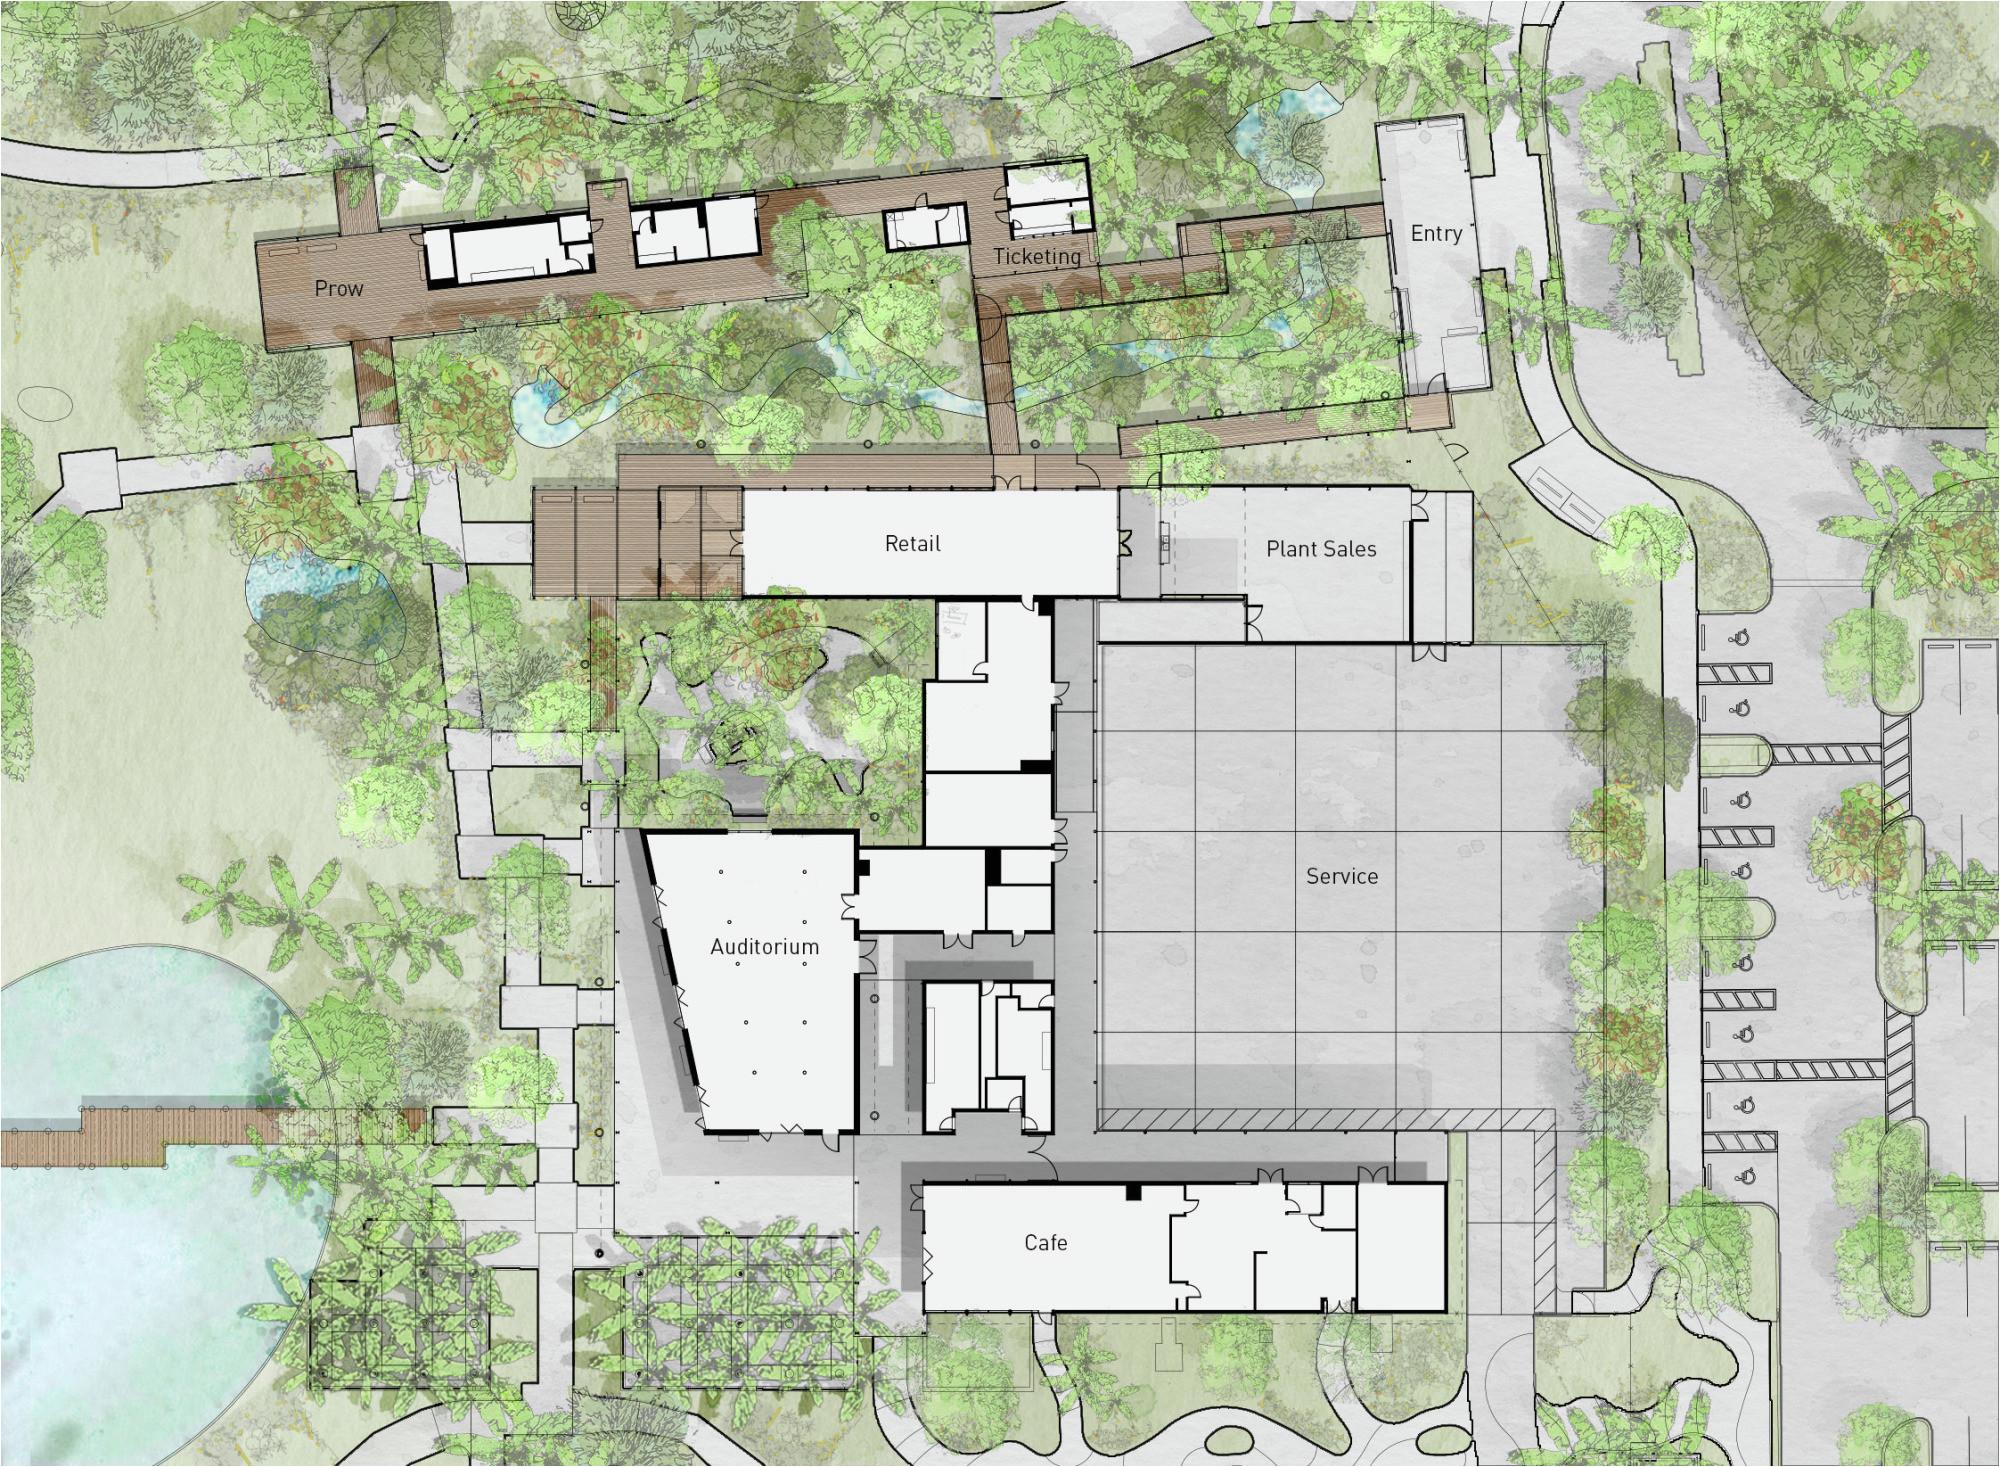 56021c07e58ece38c10000ca naples botanical garden visitor center lake flato architects floor plan